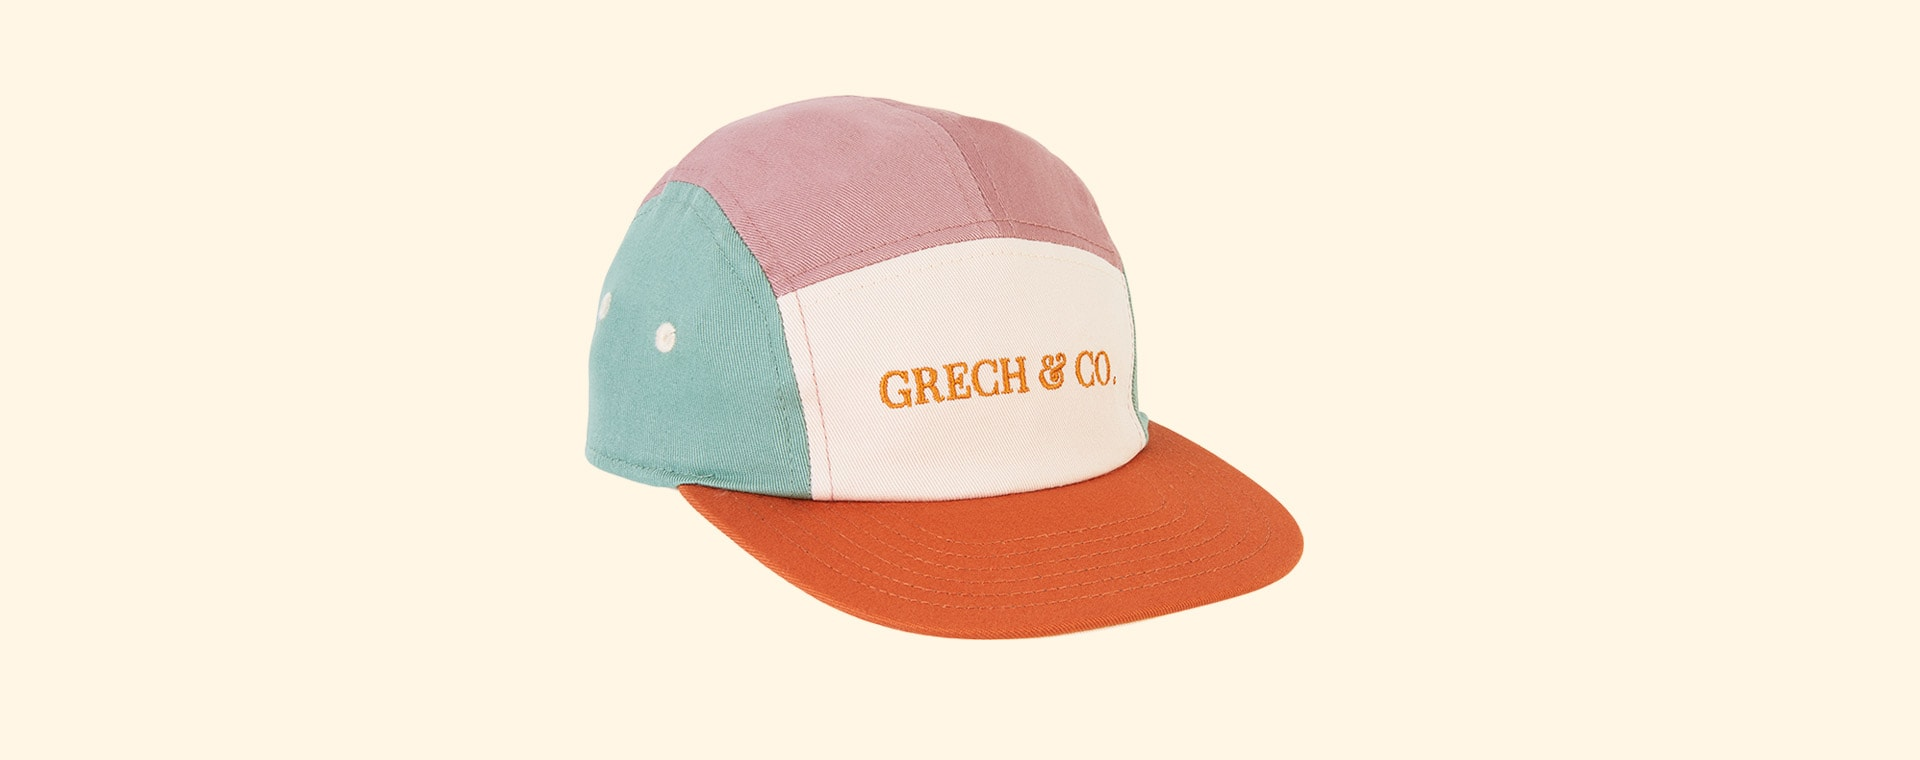 Burlwood and Shell Grech & Co Capsie Sun Cap